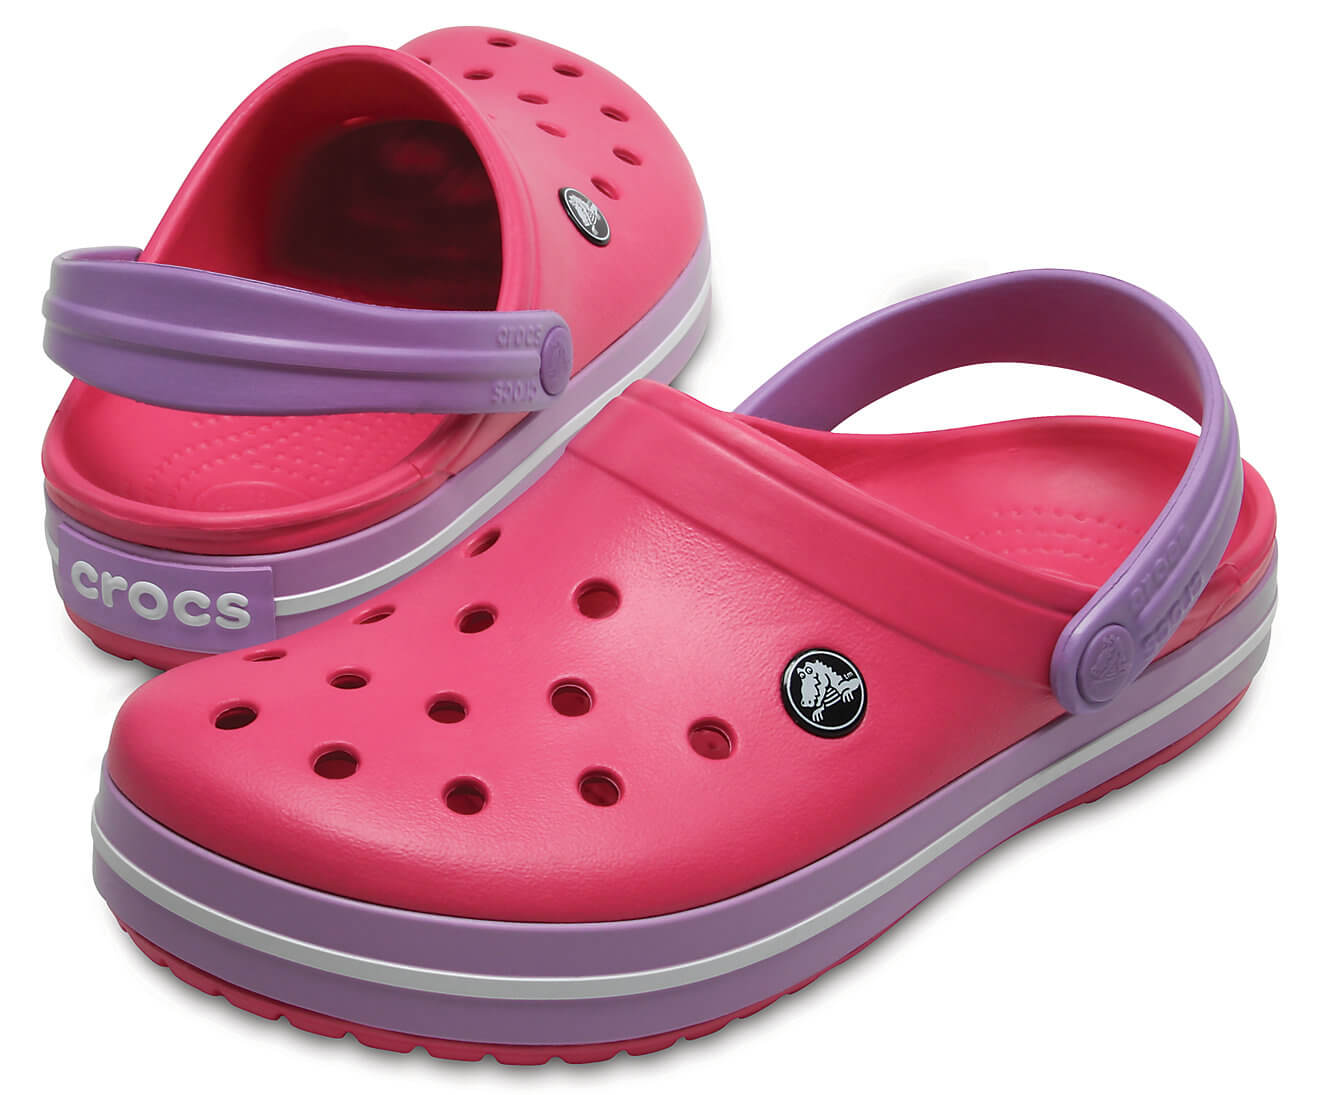 Crocs Pantofle Crocband Paradise Pink Iris 11016-6OC  2a260a0882